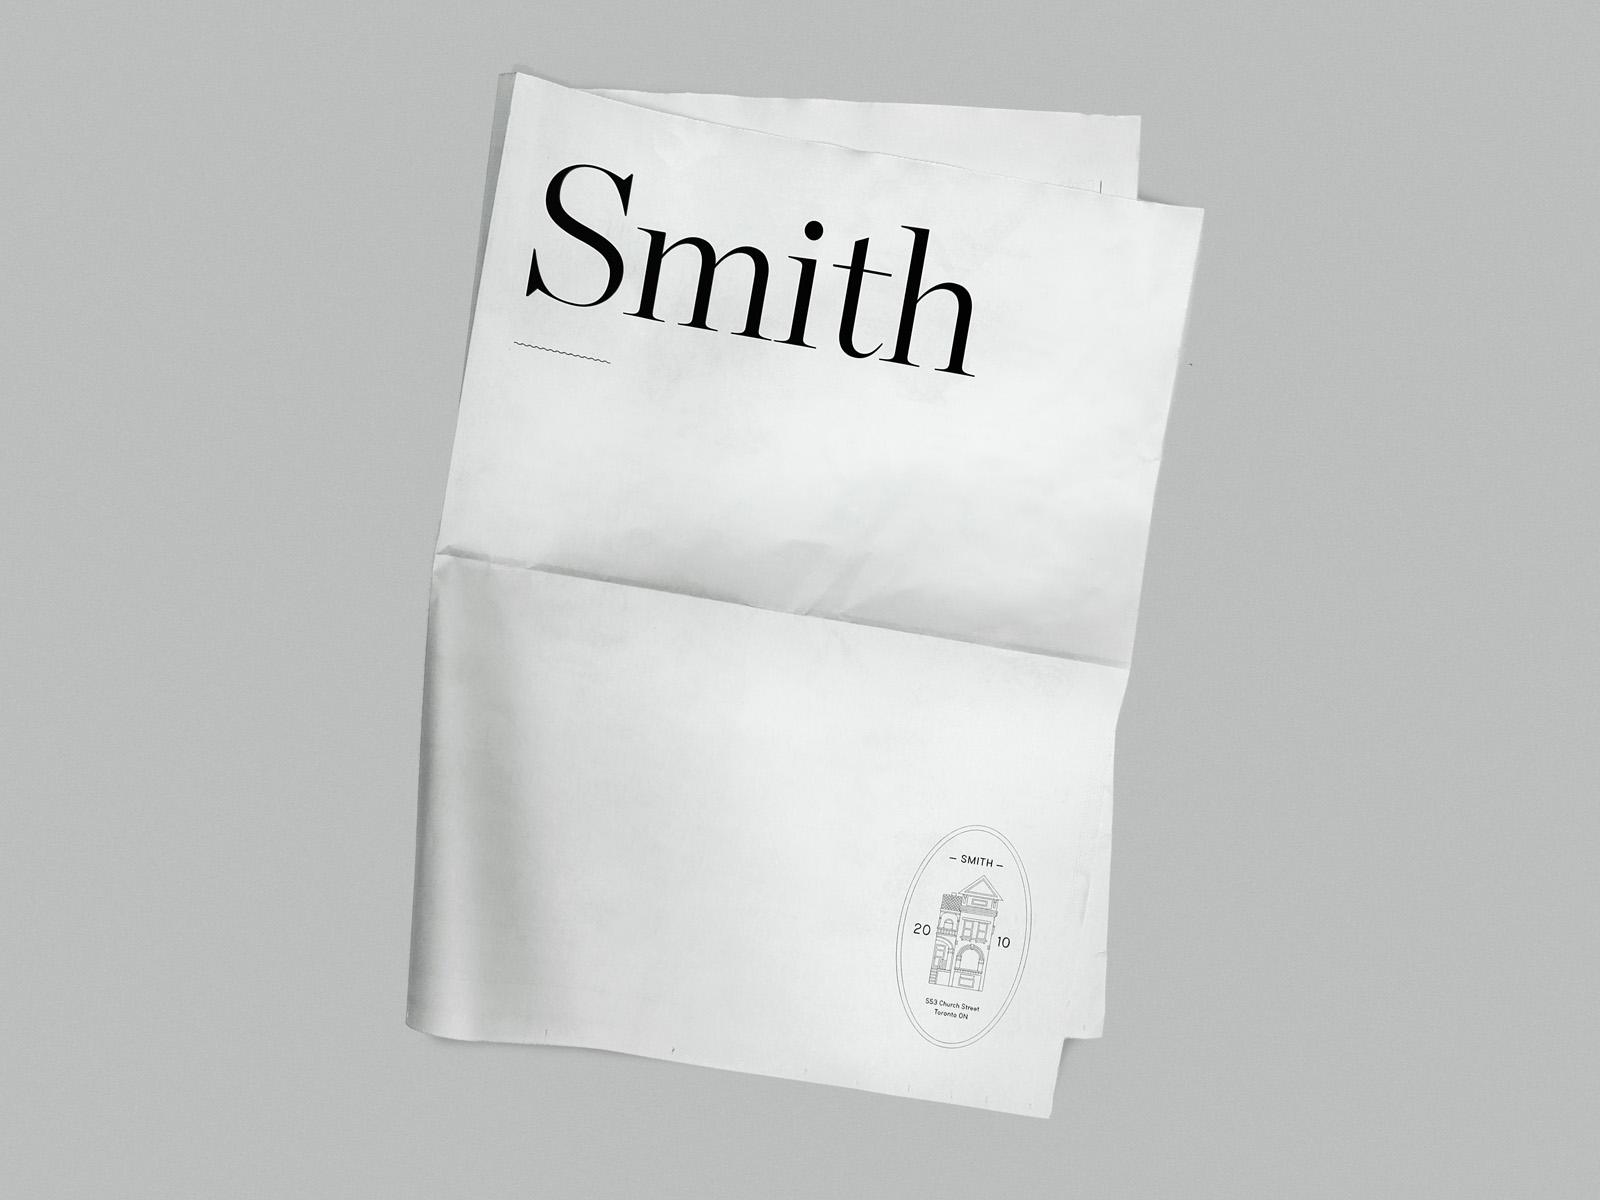 SMITH_ORIGINAL.jpg